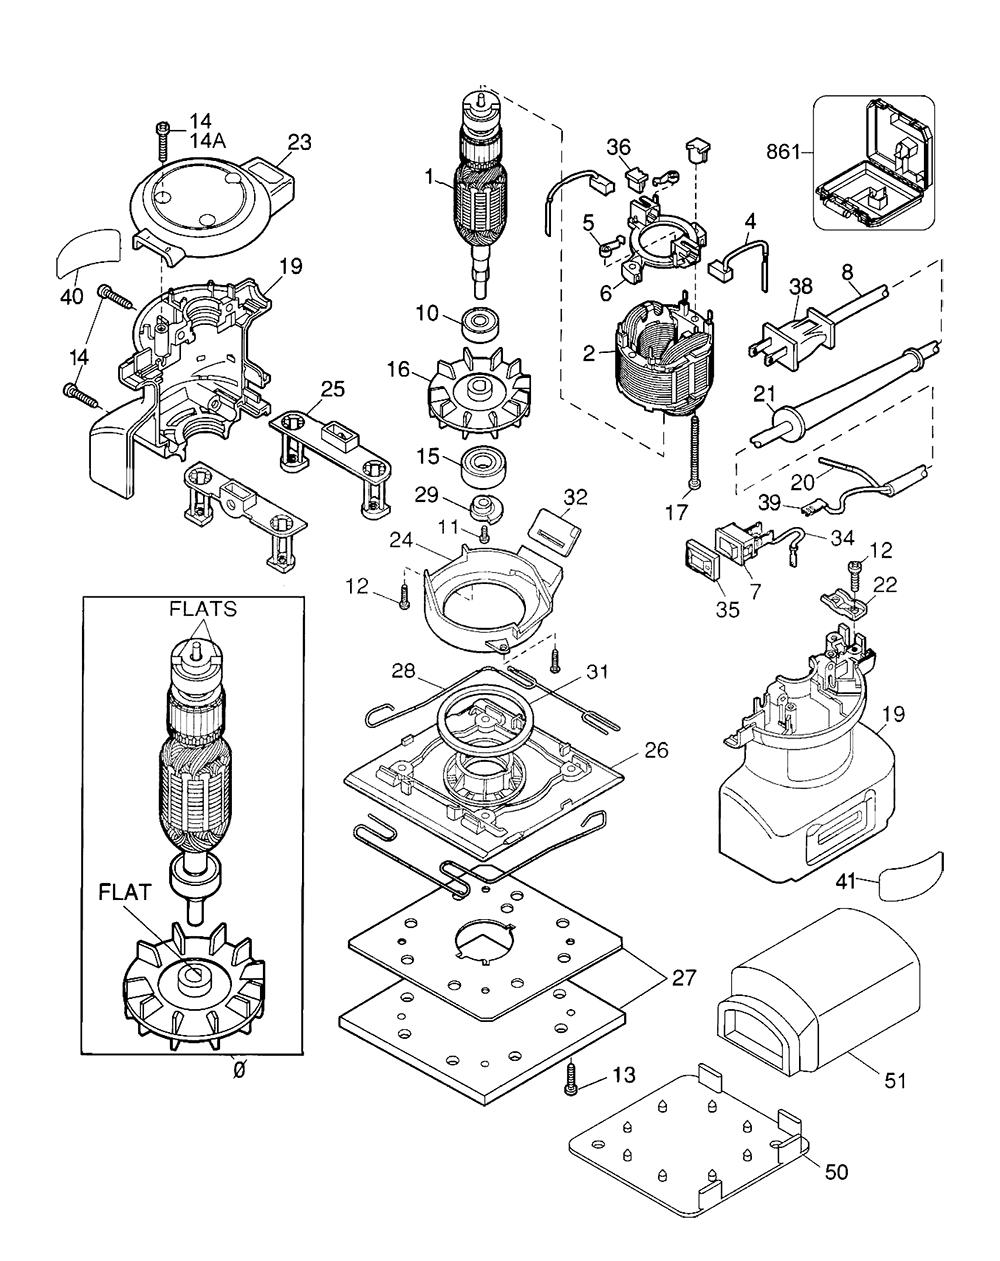 Schumacher Se 1052 Battery Charger Parts Se50 Wiring Diagram